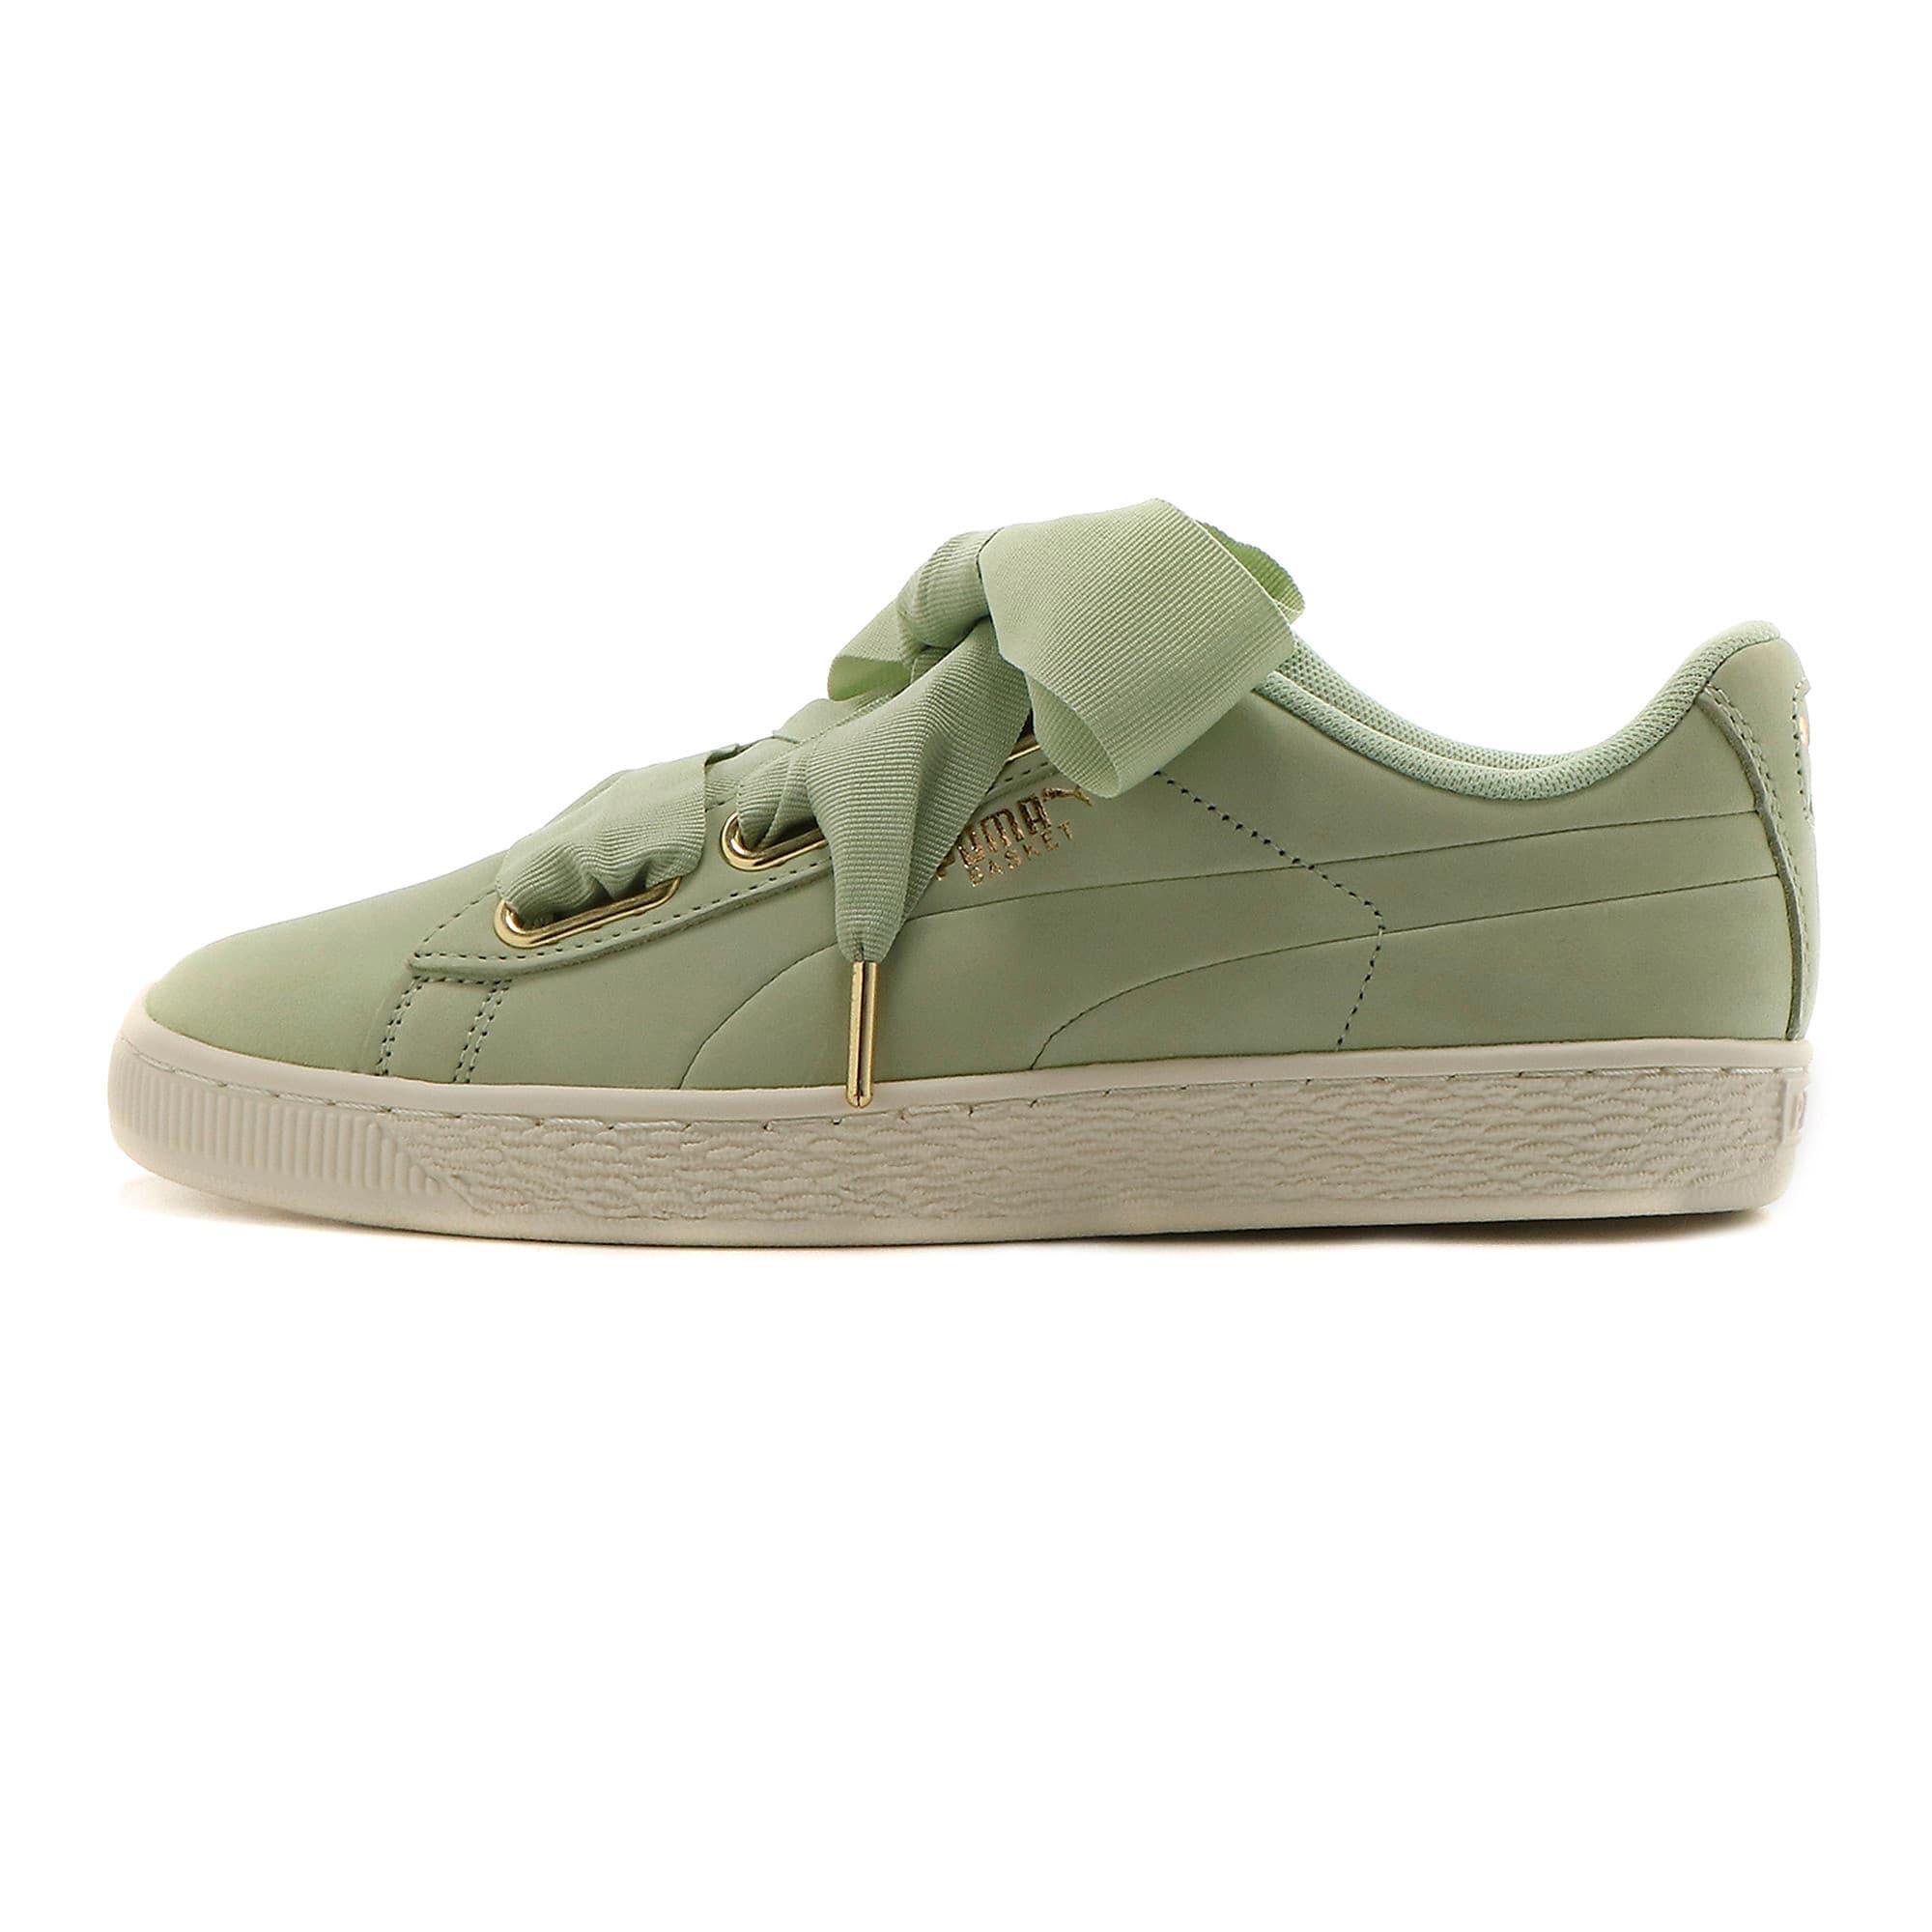 Thumbnail 1 of Basket Heart Soft Women's Sneakers, Smoke Green-Marshmallow, medium